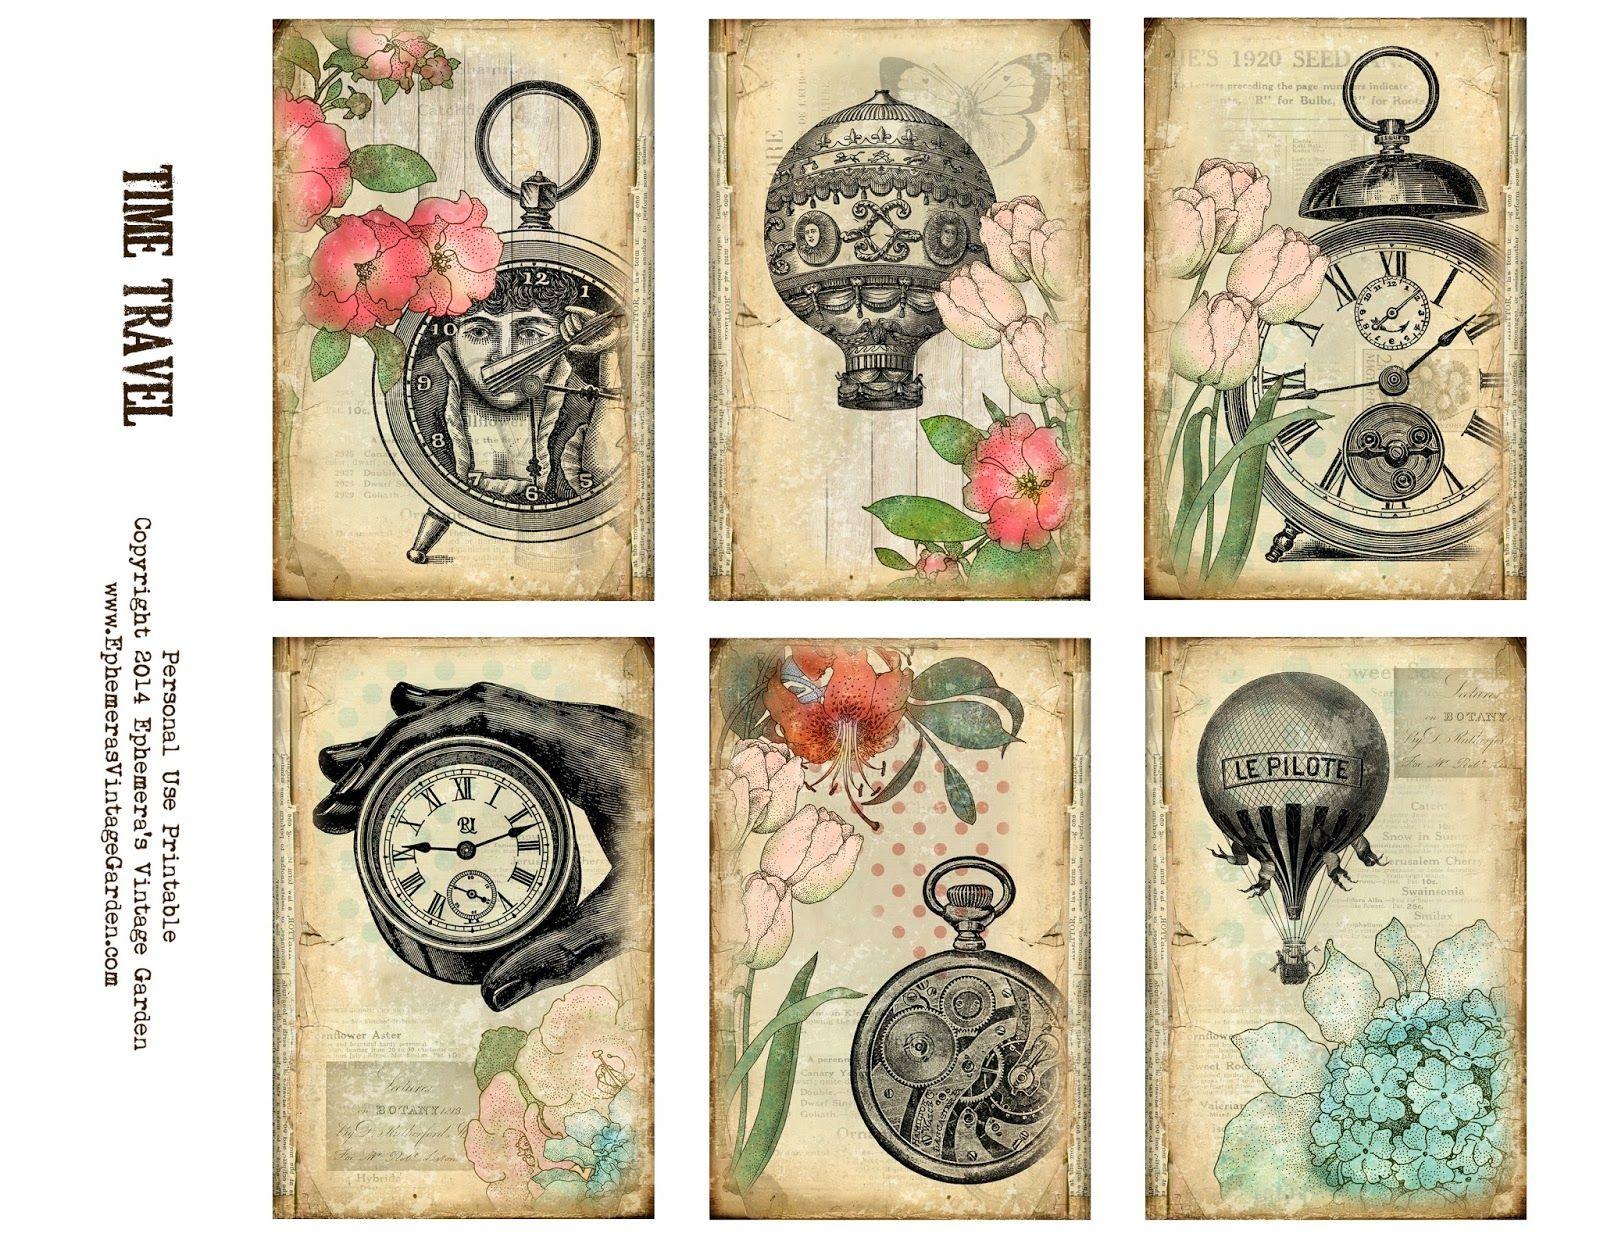 Free Printable Steampunk Journaling Cards Steampunk Cards Journal Cards Steampunk Crafts